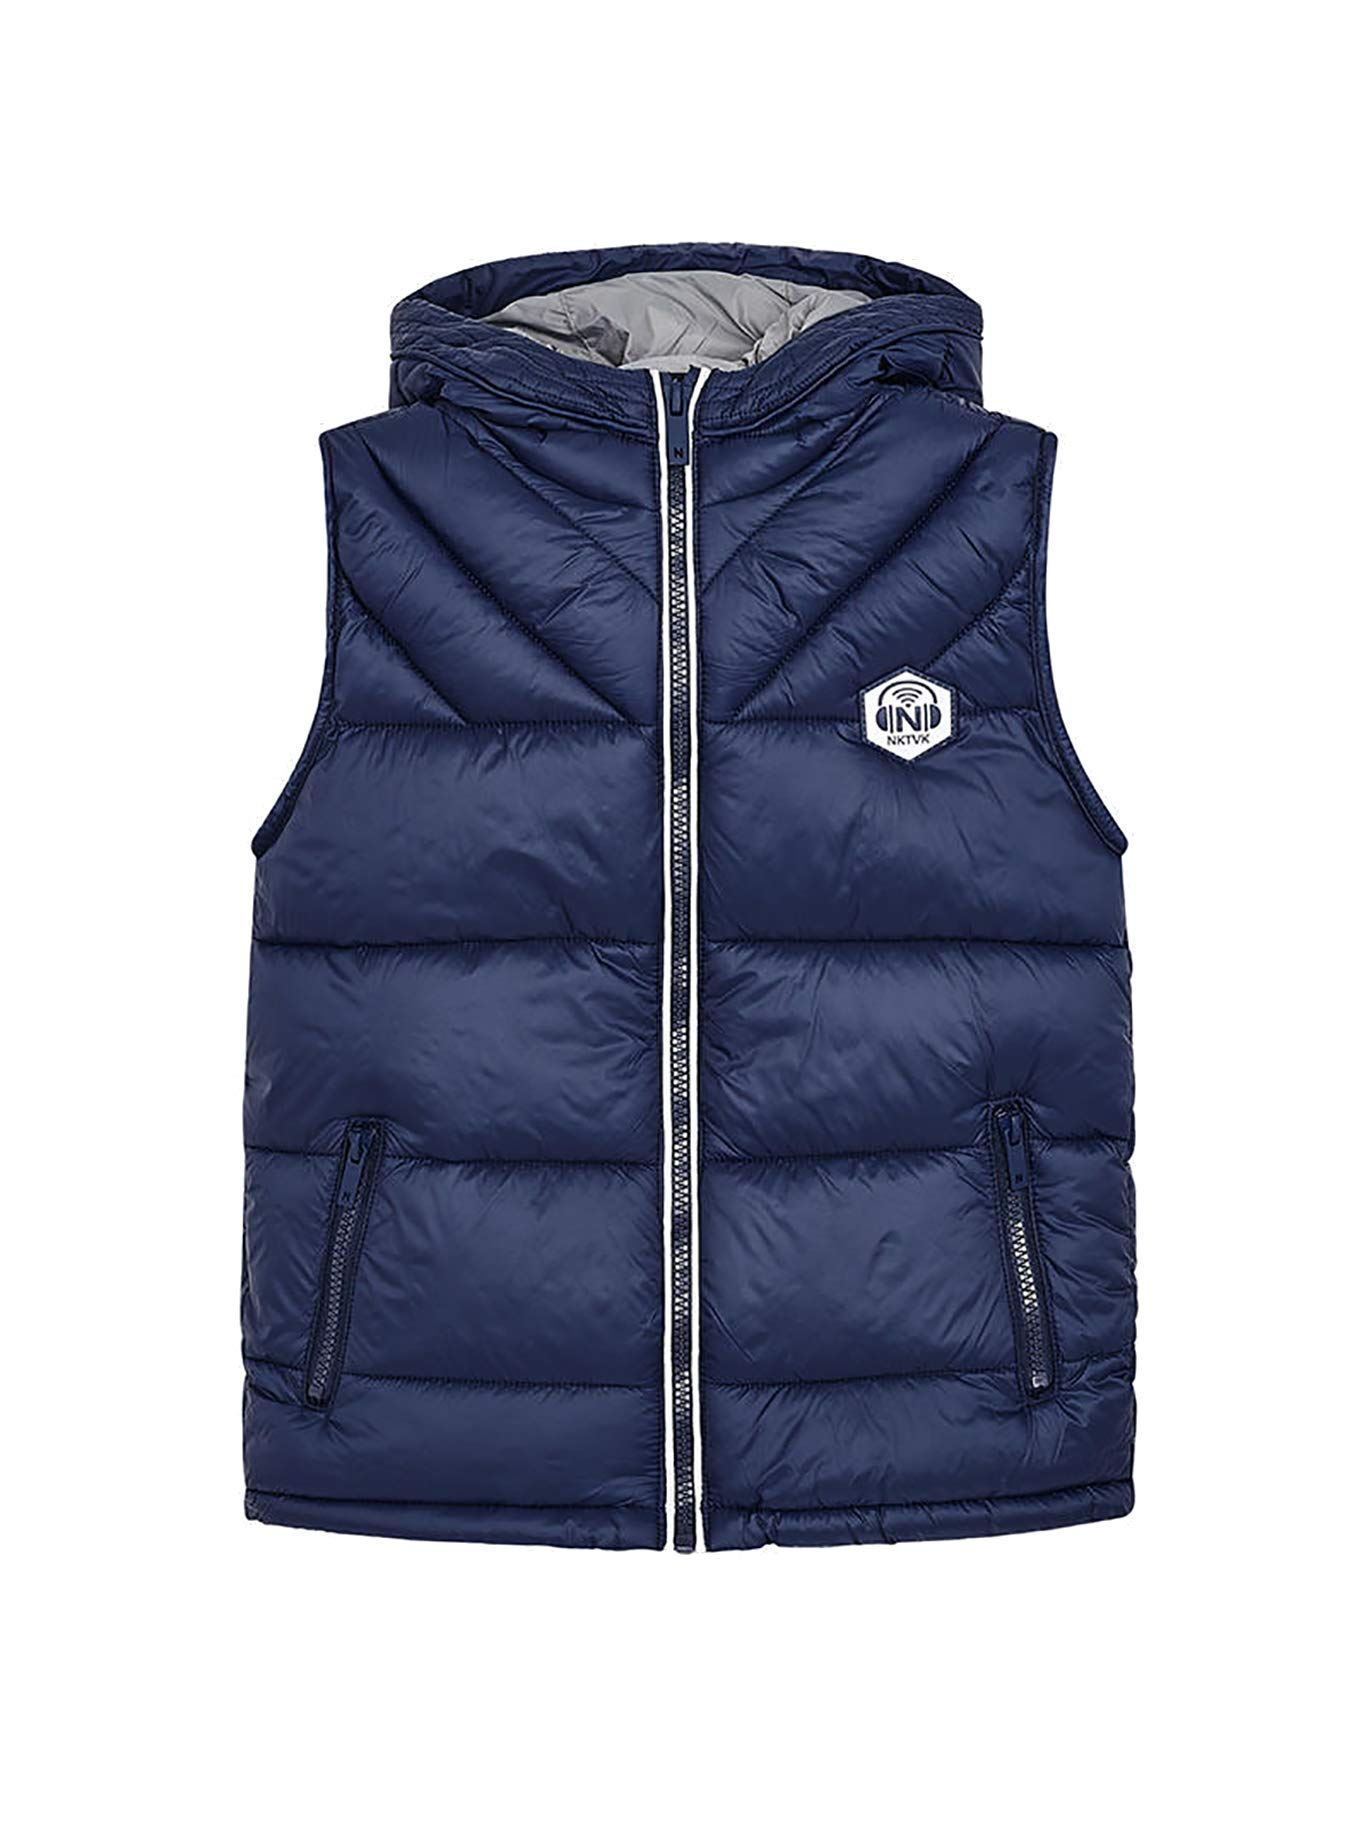 Mayoral 18-07411-036 - Padded Vest for Boys 16 Years Indigo